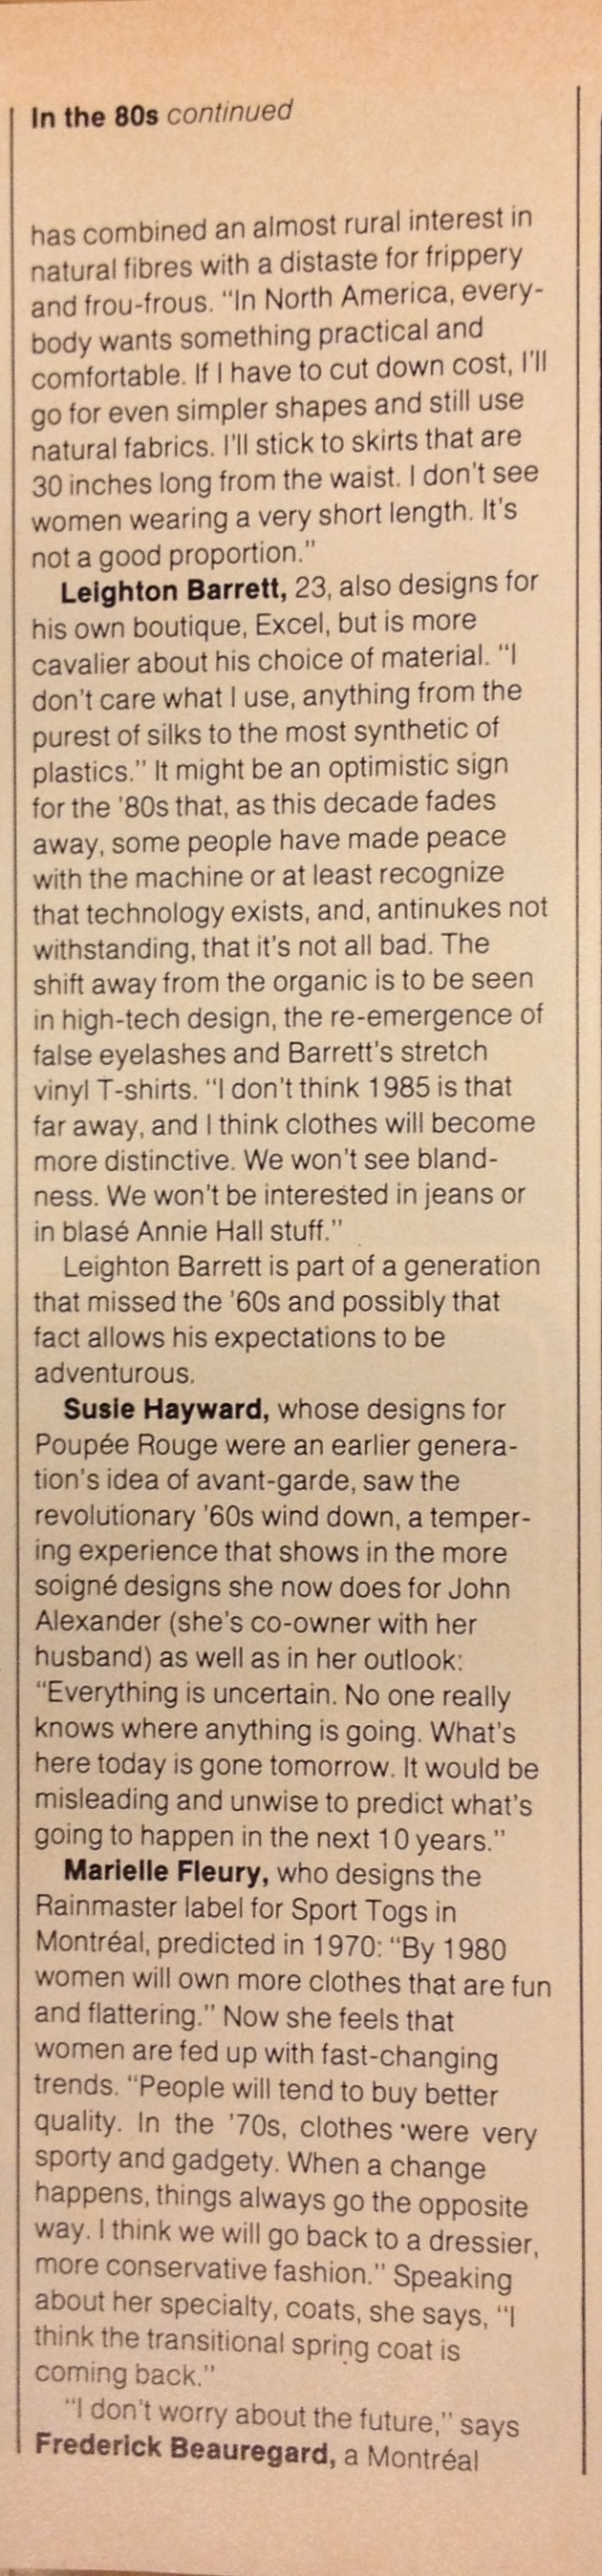 group fashion winter 1979 18 - Copy